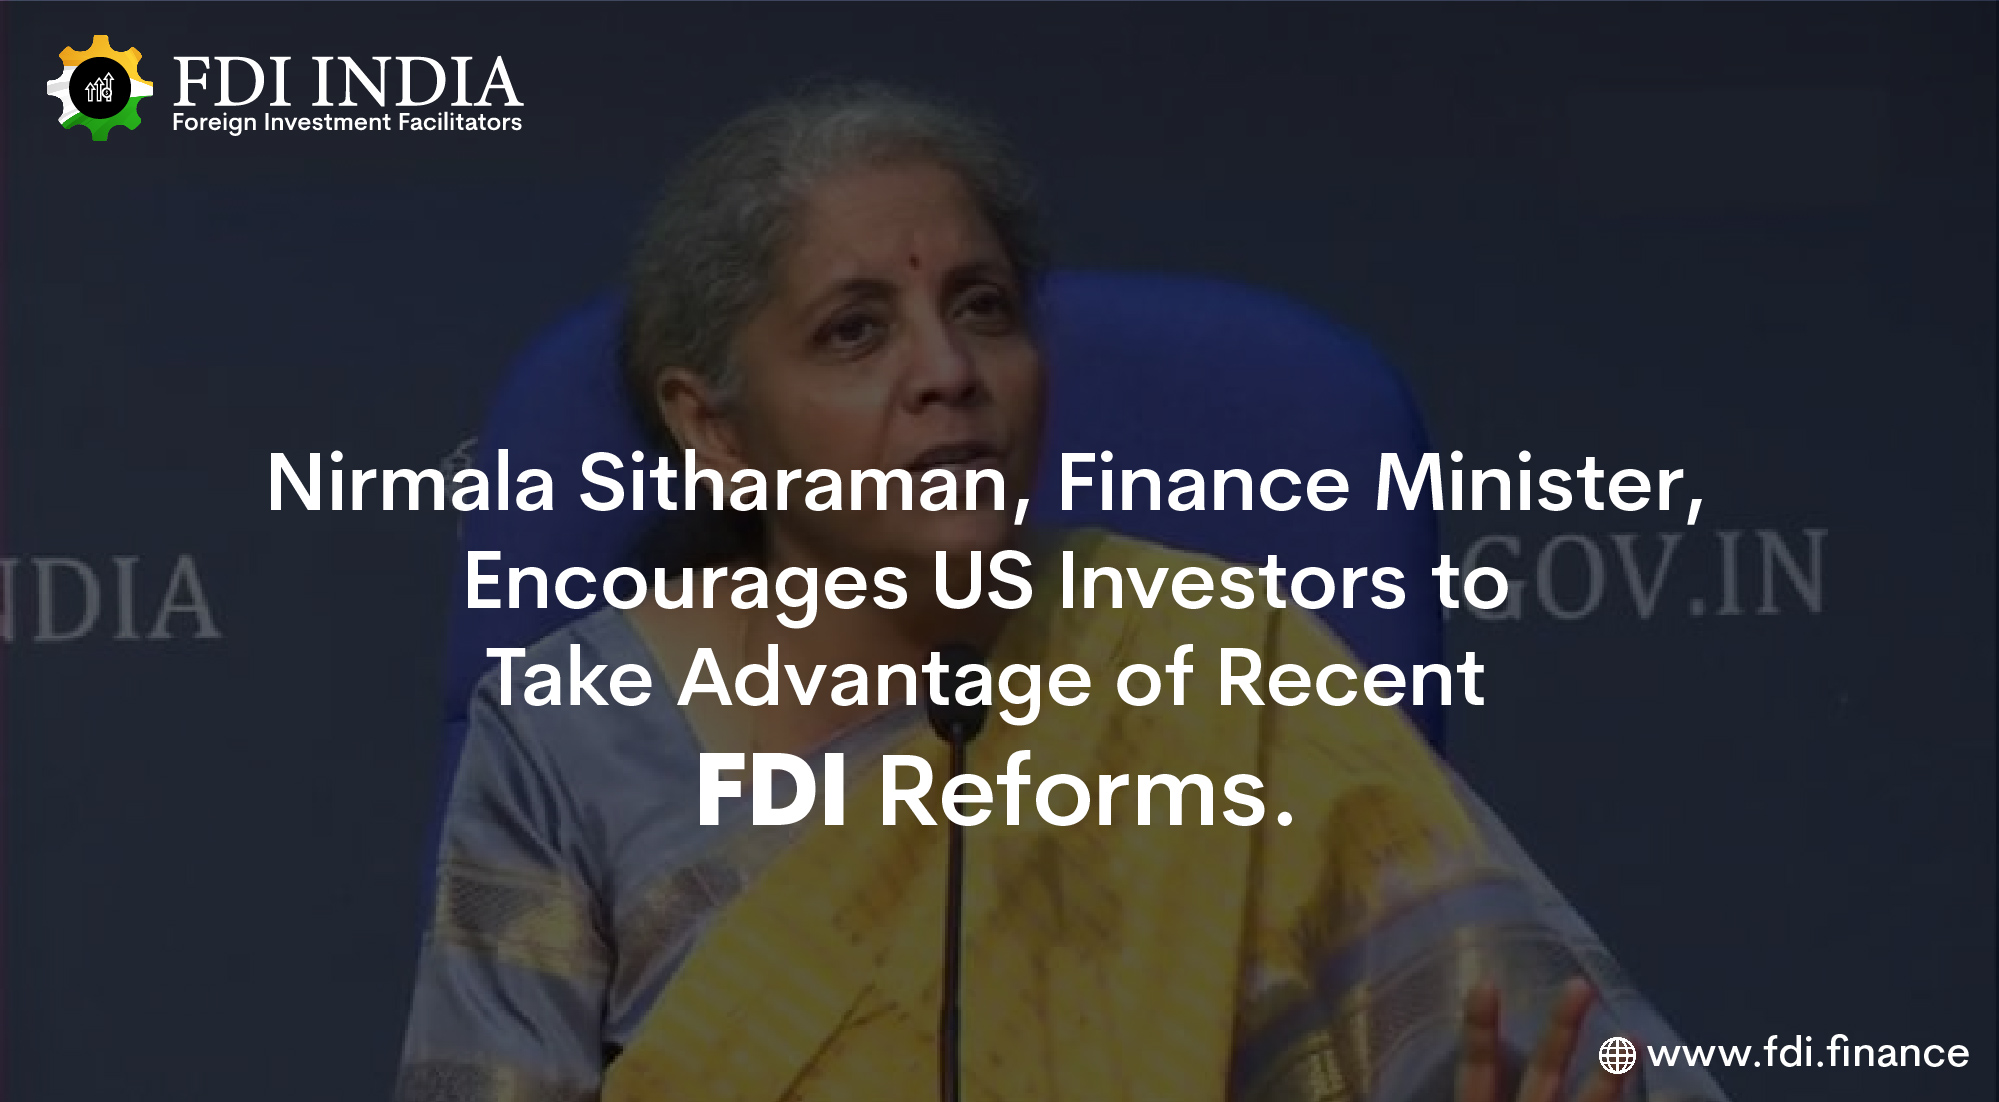 Nirmala Sitharaman, Finance Minister, Encourages US Investors to Take Advantage of Recent FDI Reforms